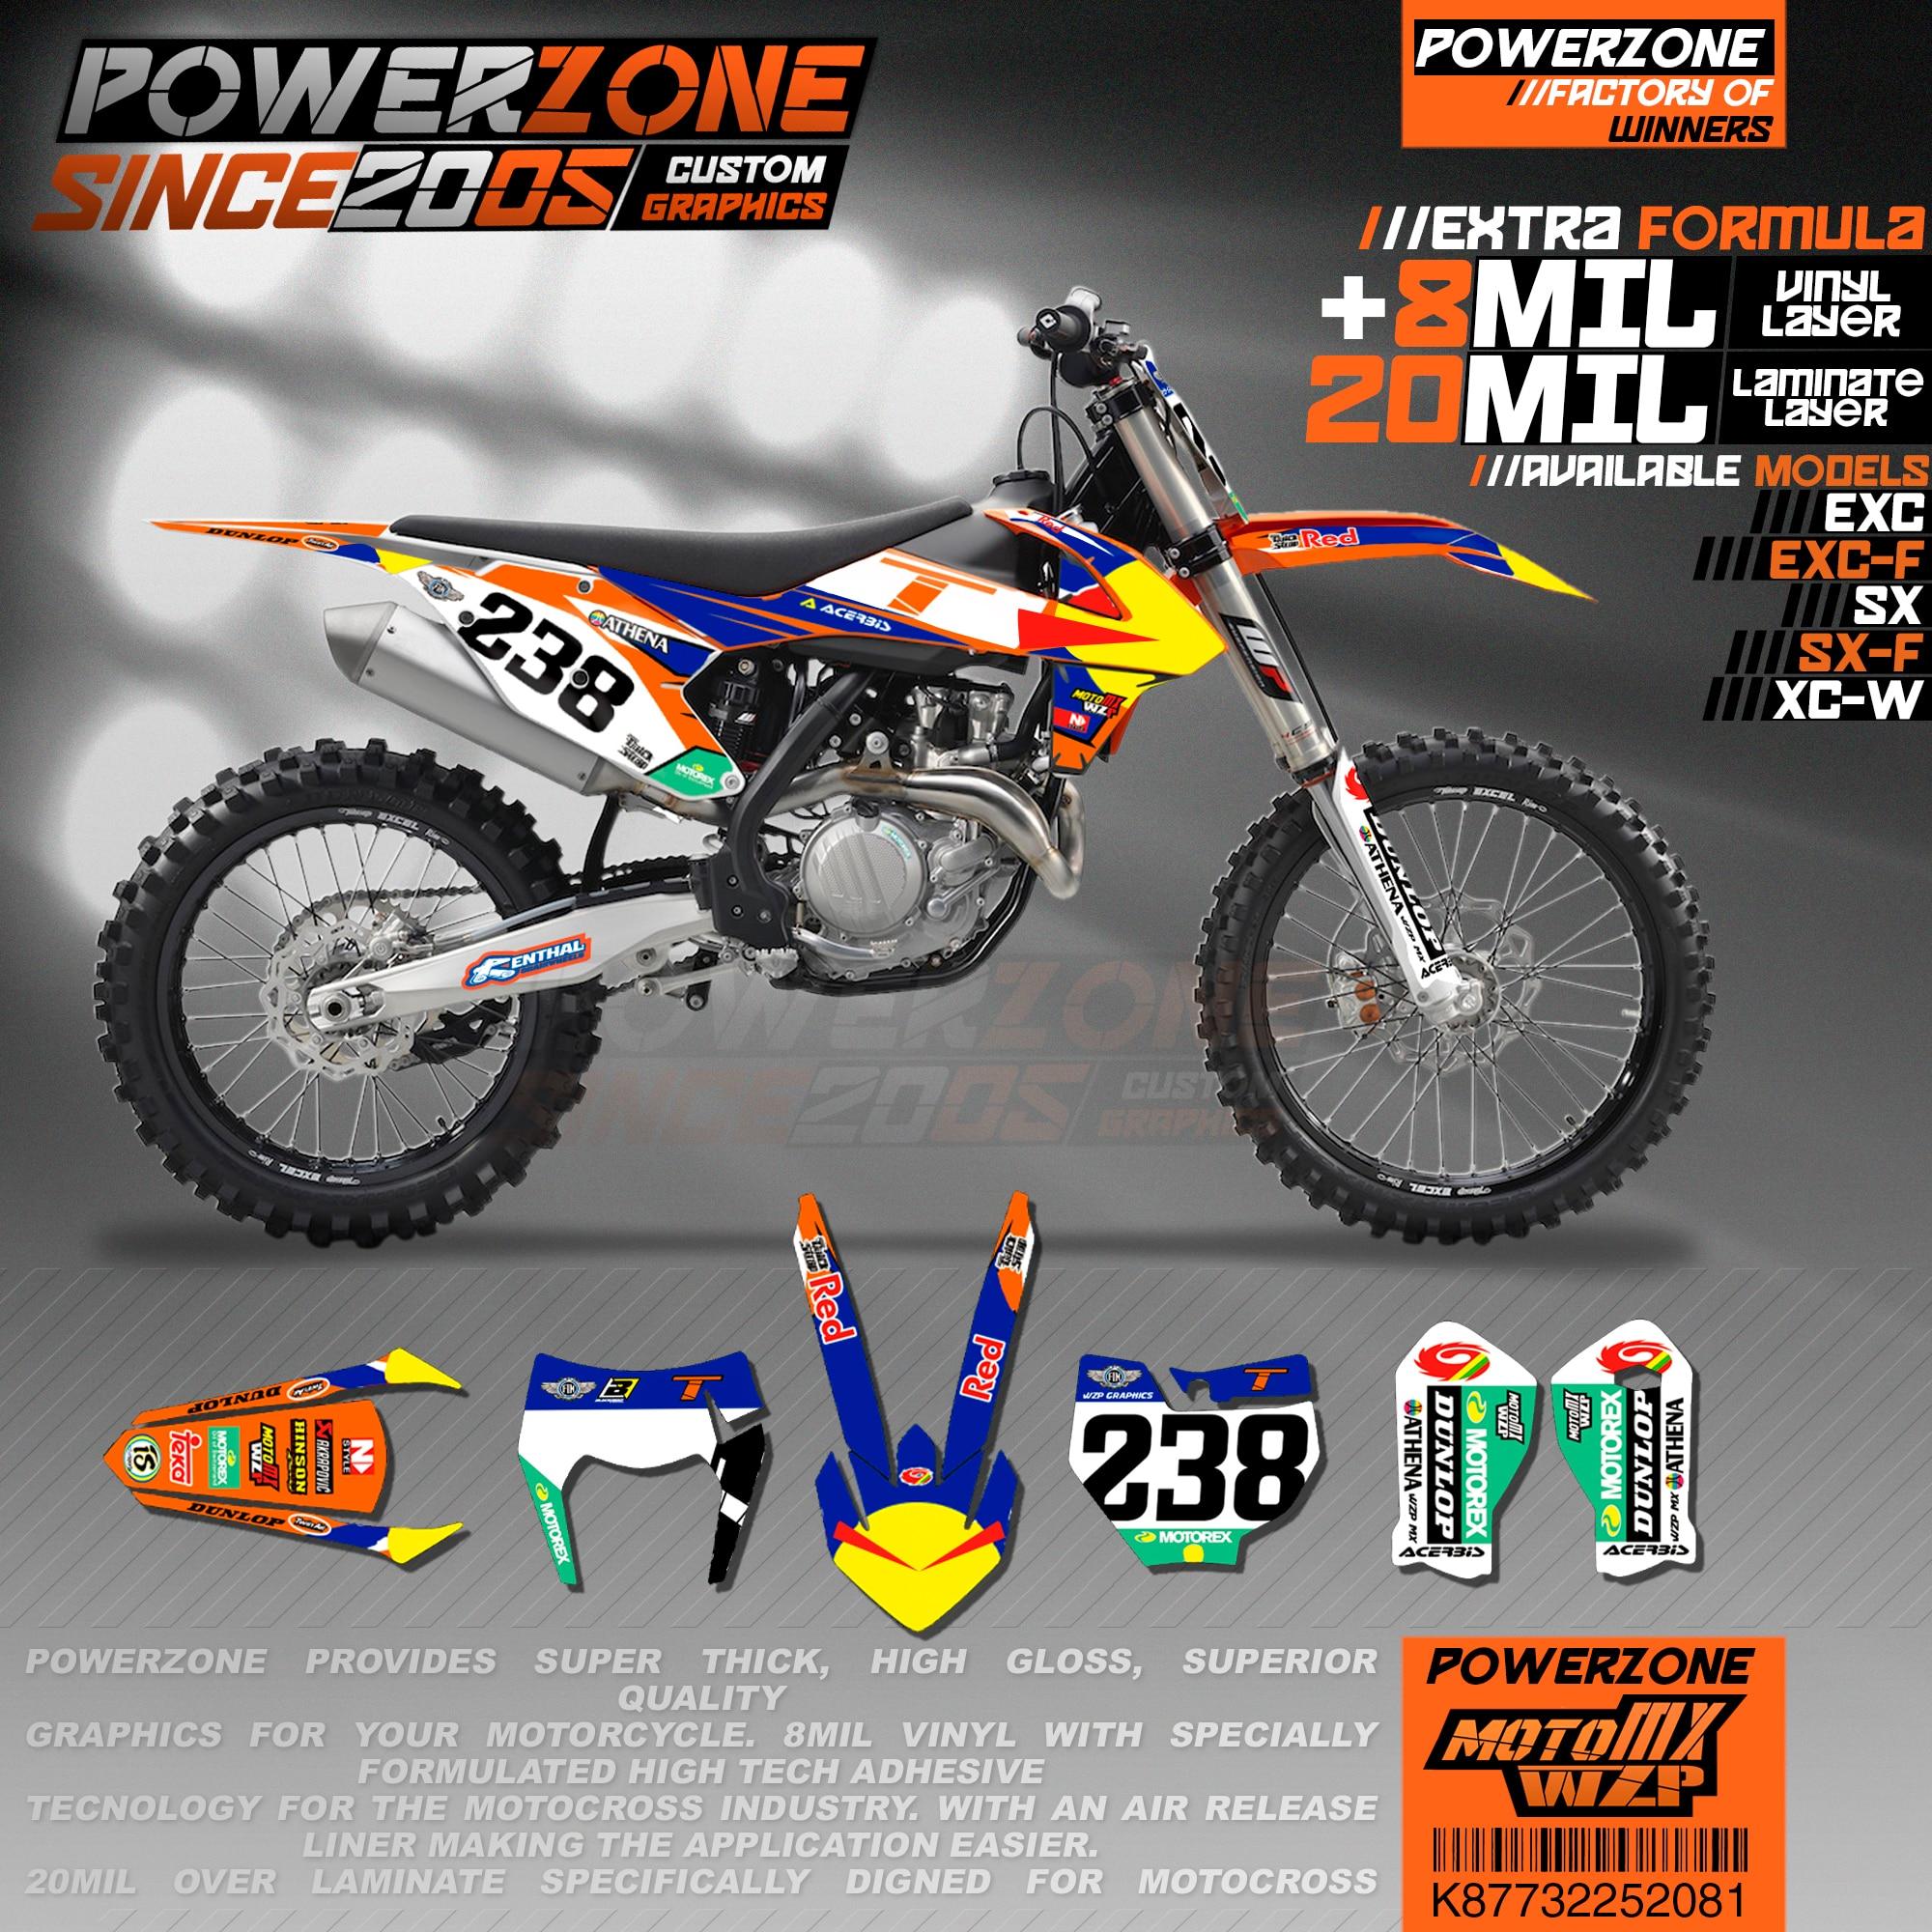 FOR KTM 125-450 2016-2018 CUSTOM RADIATOR PROTECTOR GRAPHICS MX MOTOCROSS DECALS